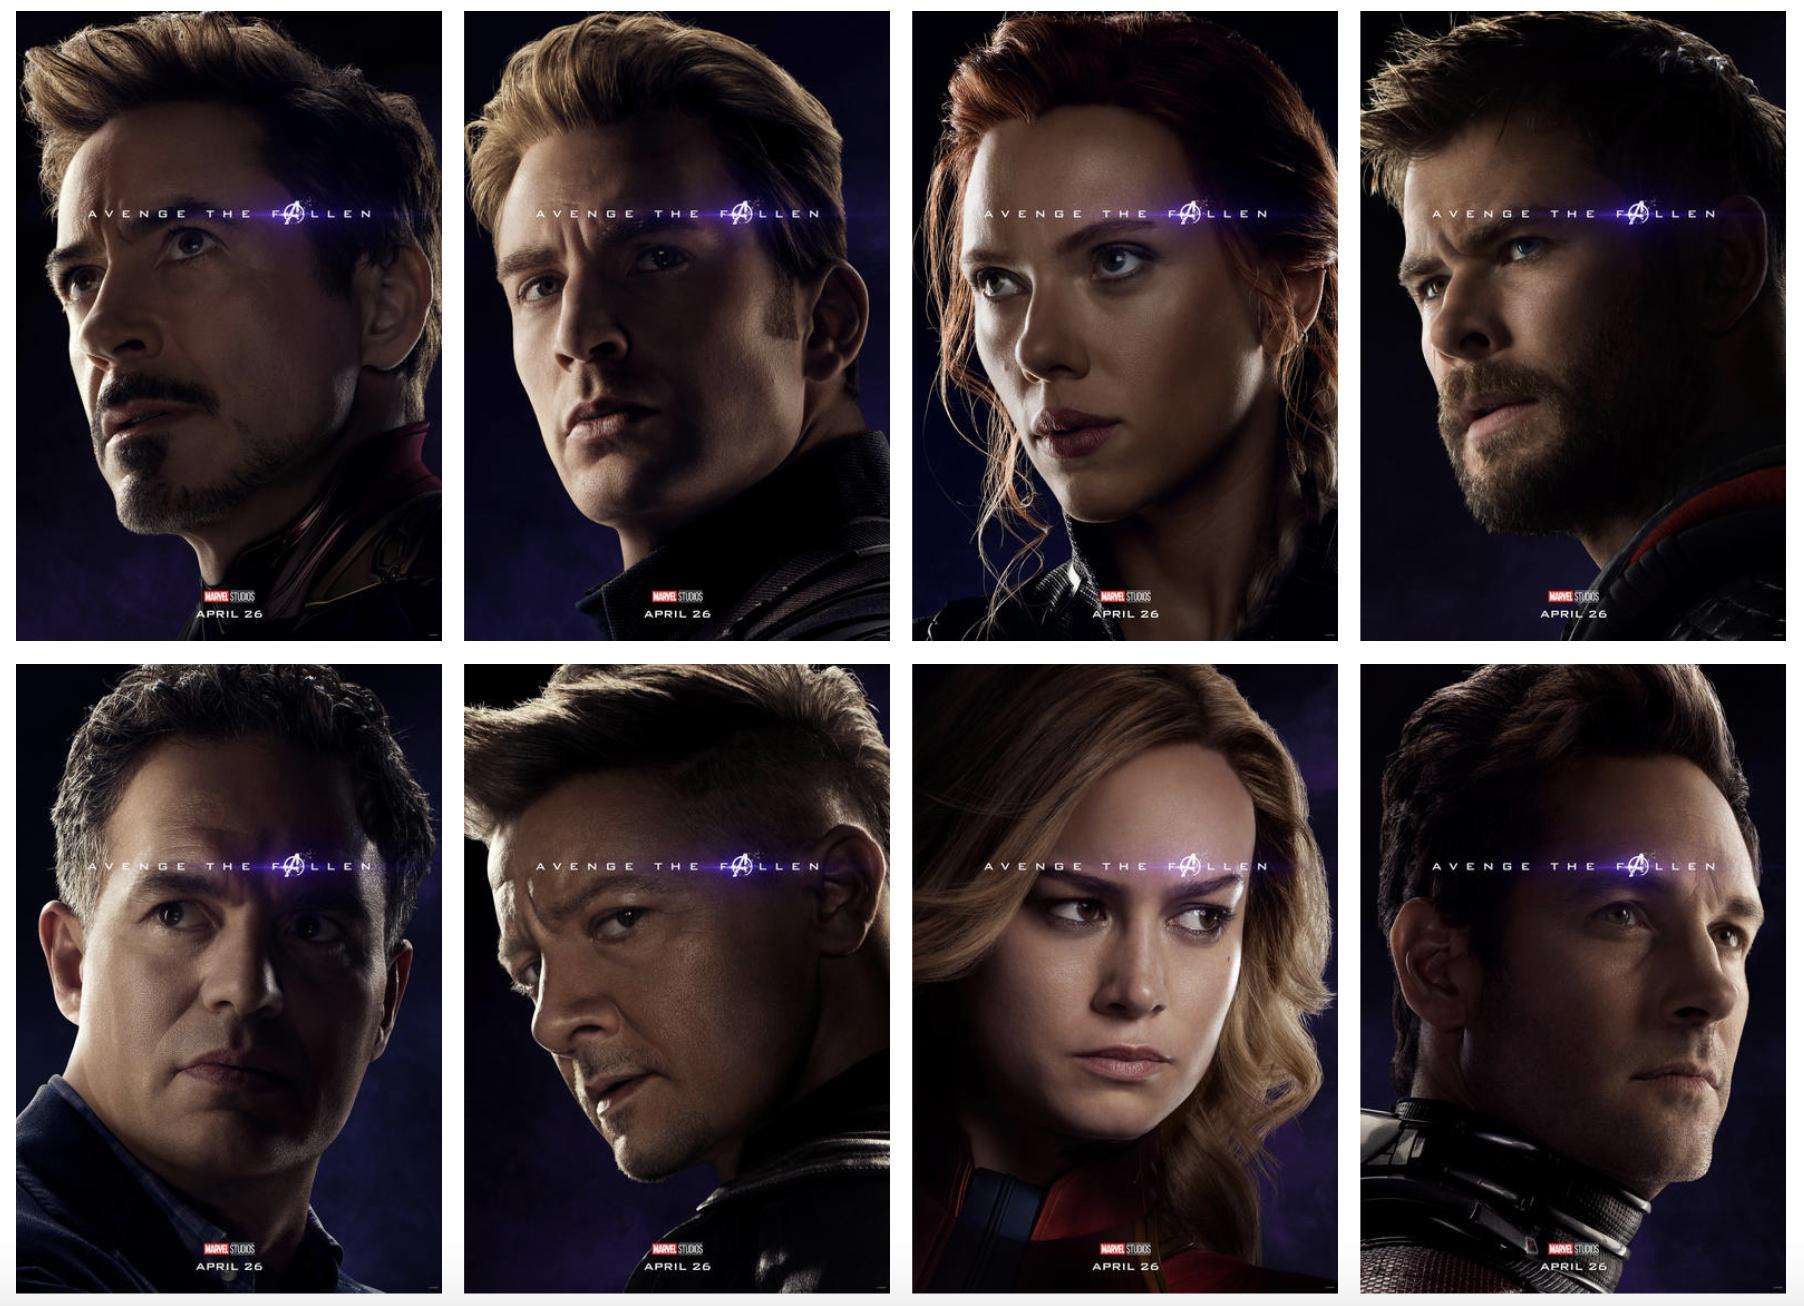 Indian Marvel fans, rejoice: AR Rahman to compose song for 'Avengers: Endgame'